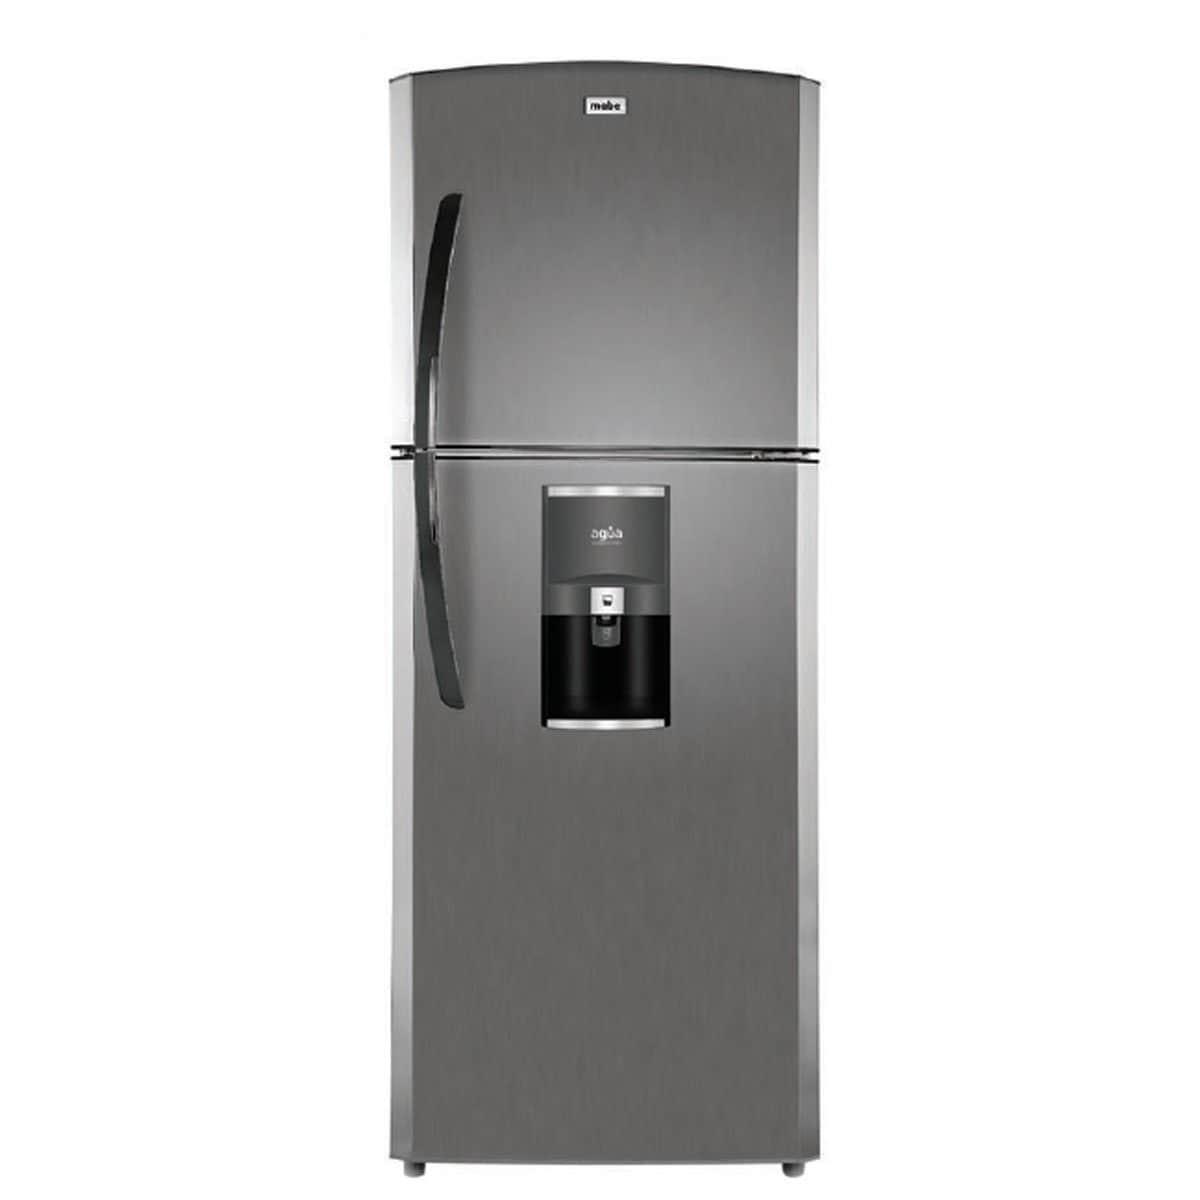 Refrigerador Mabe 2 Puertas Grafito